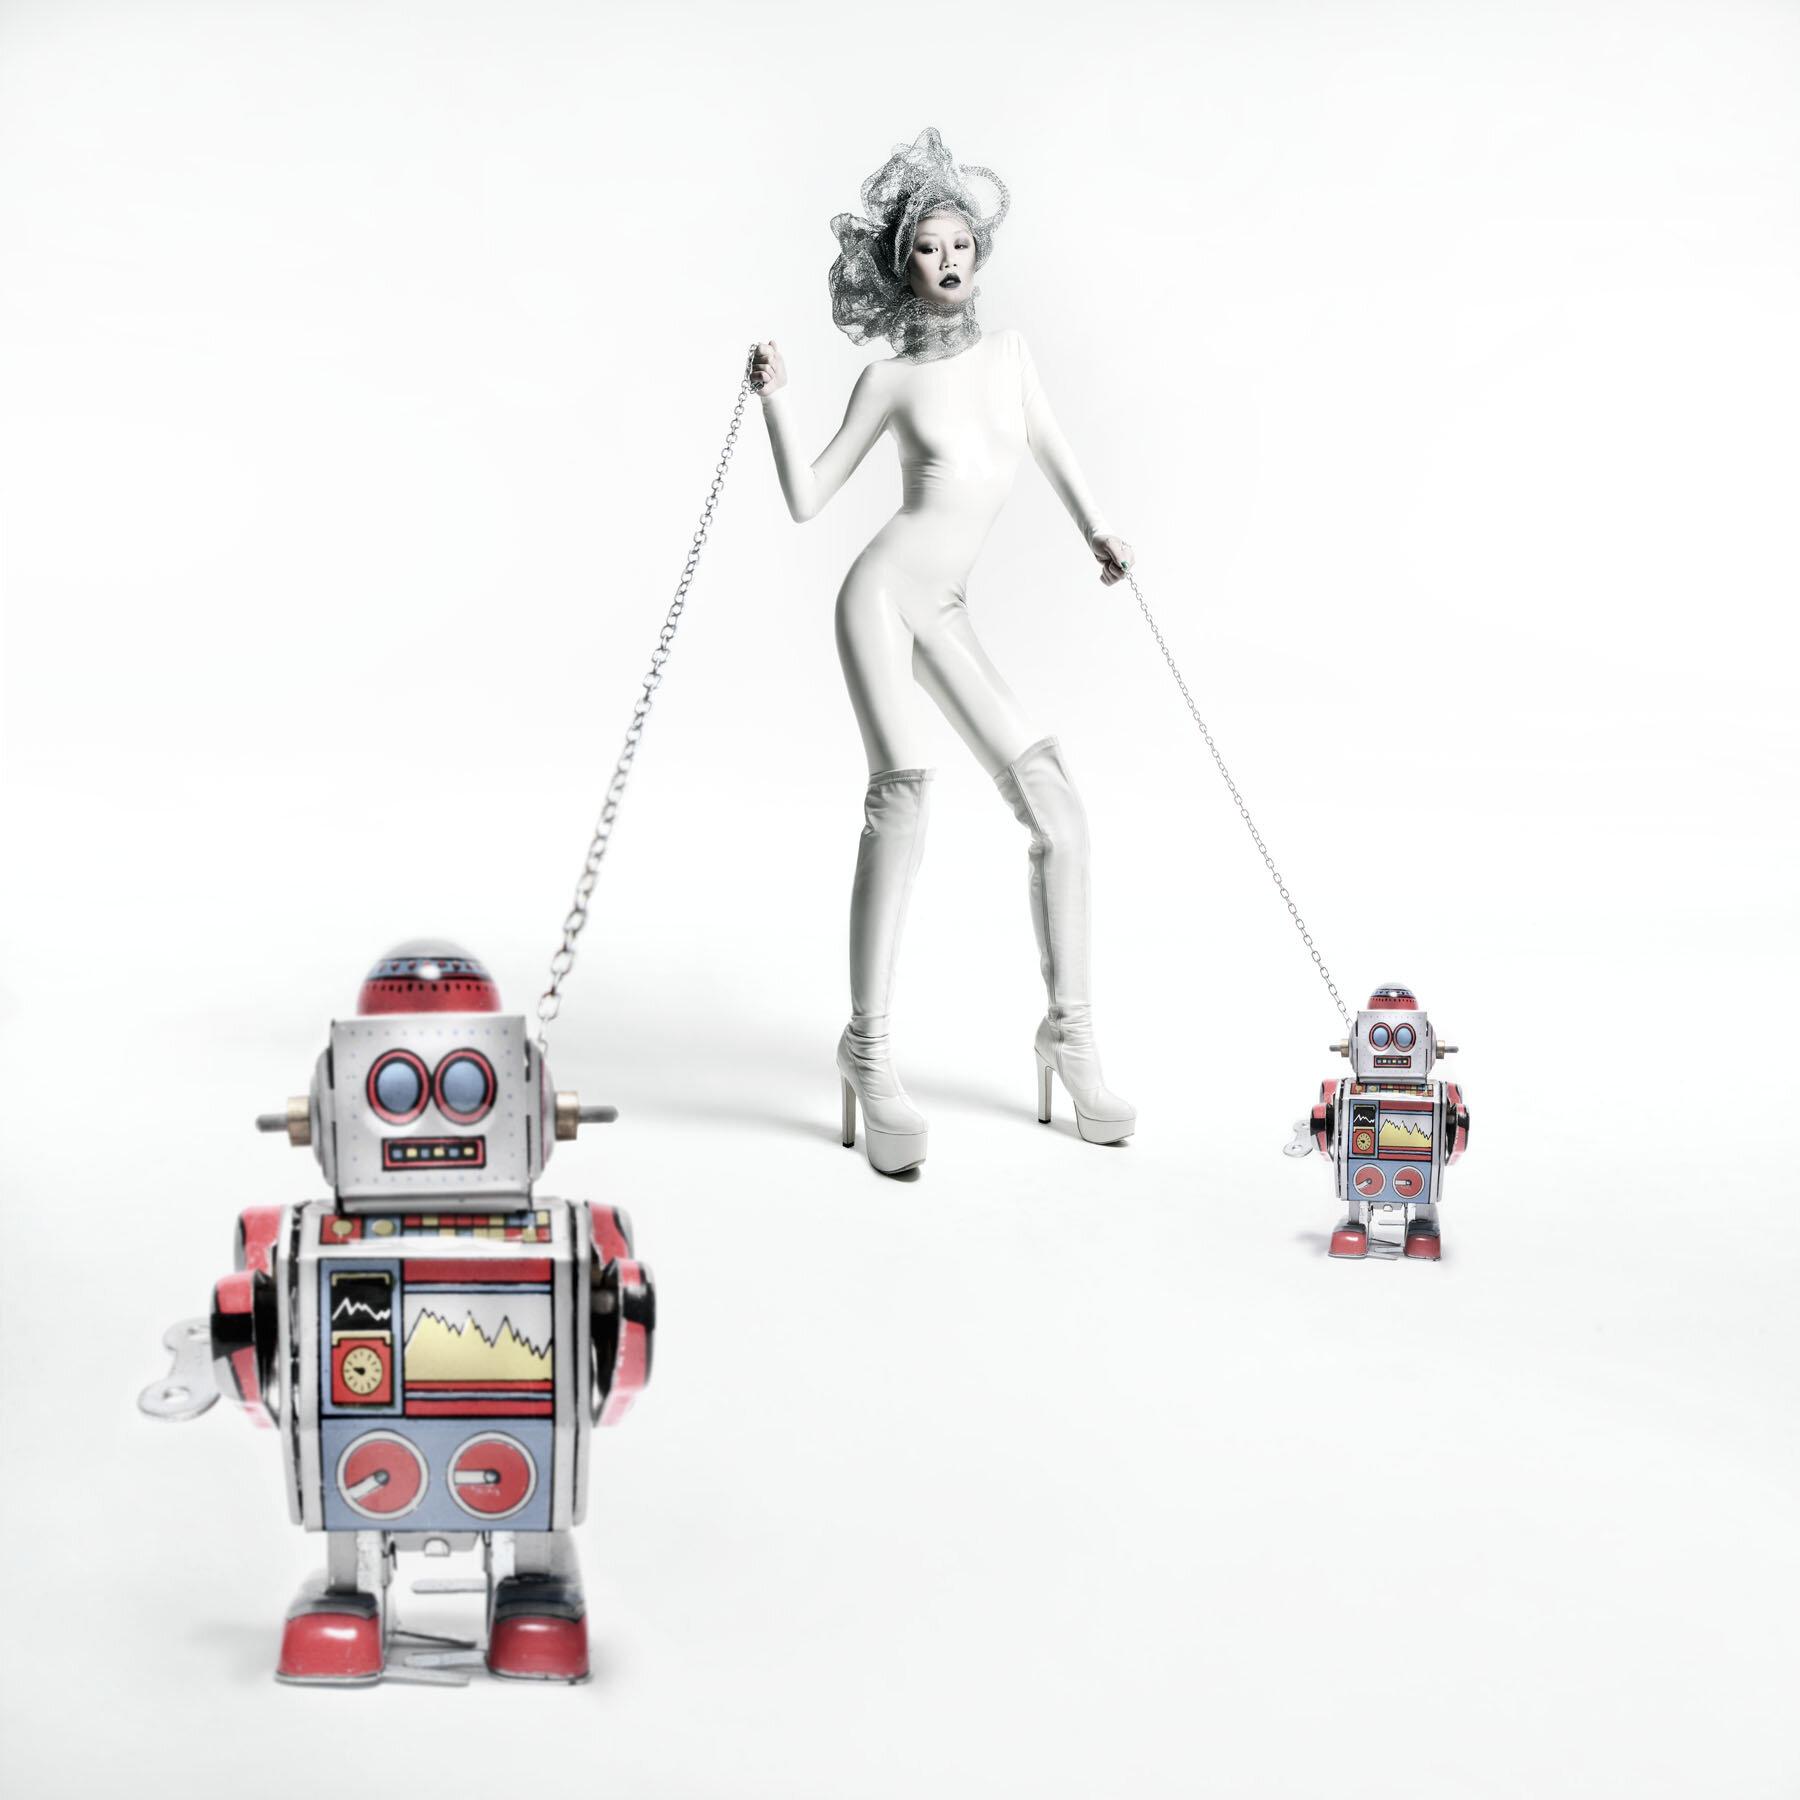 Robots aIMG_3691.jpg